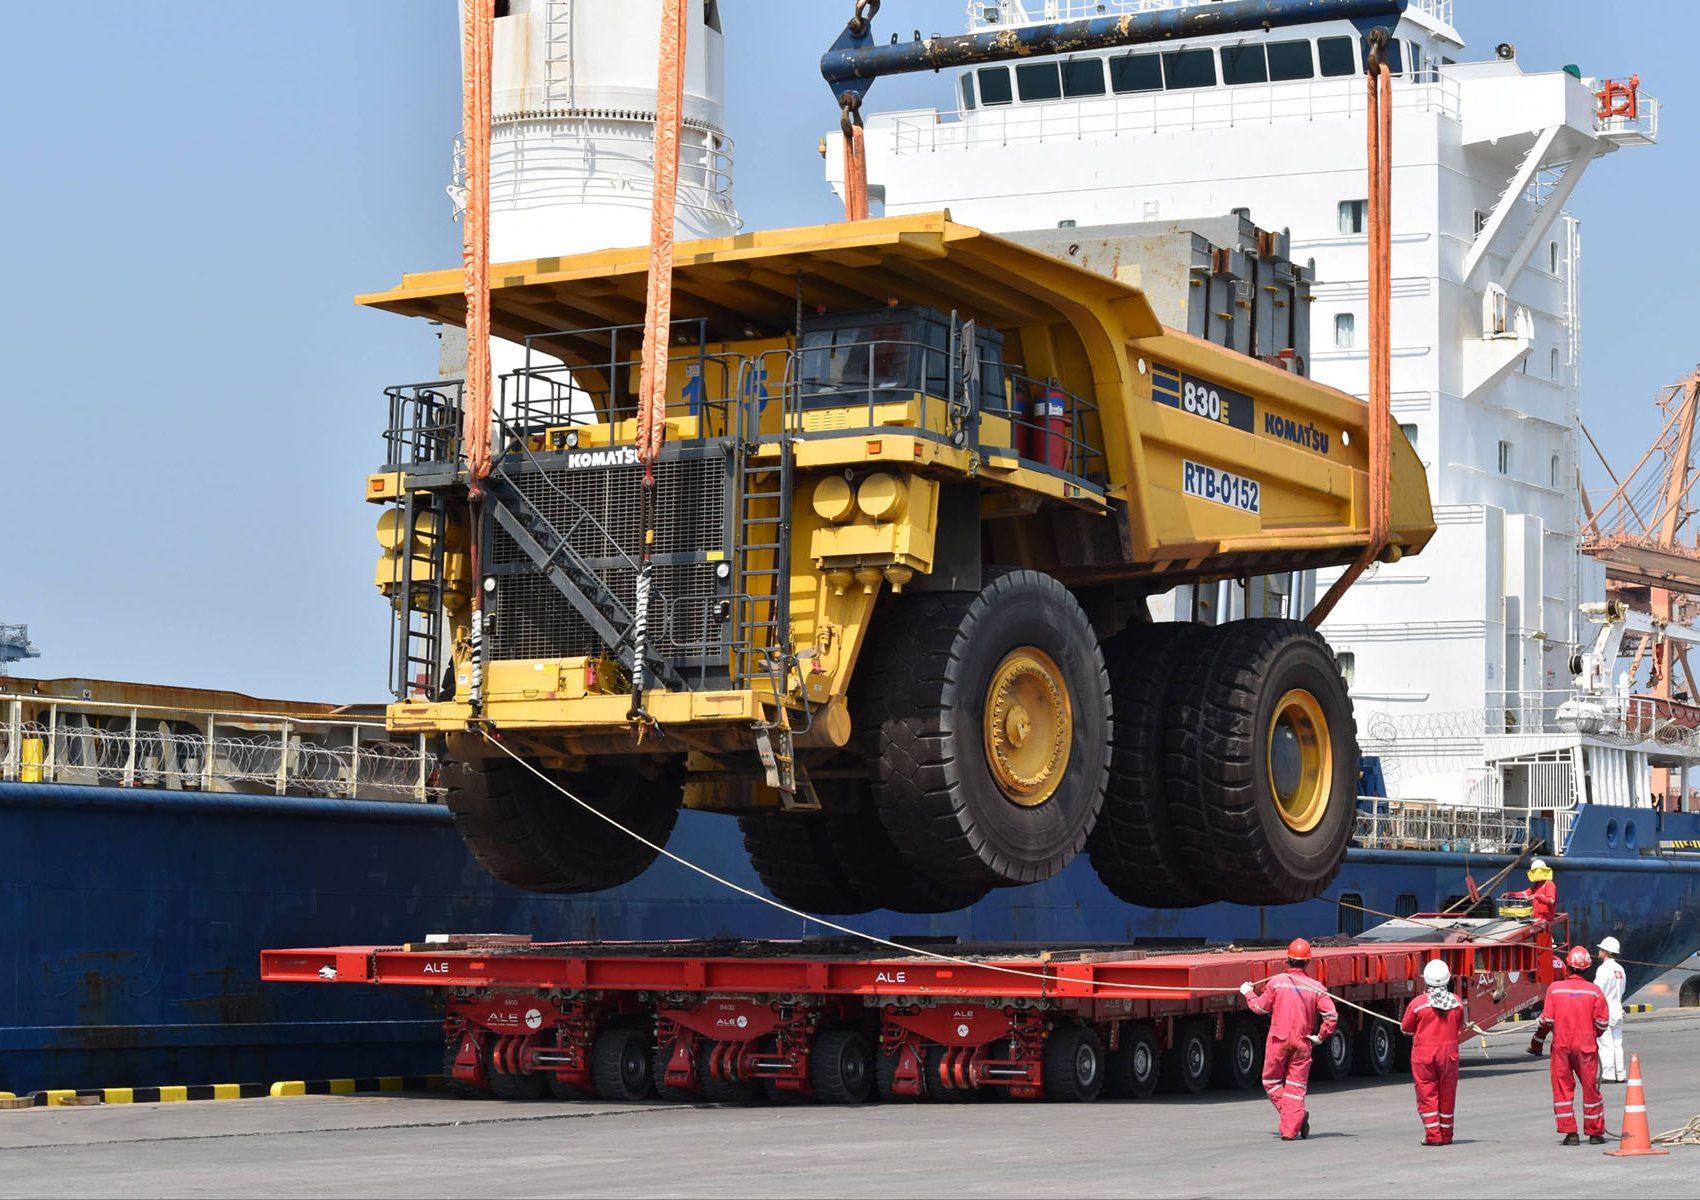 Crane lowering a Komatsu 830E mining truck